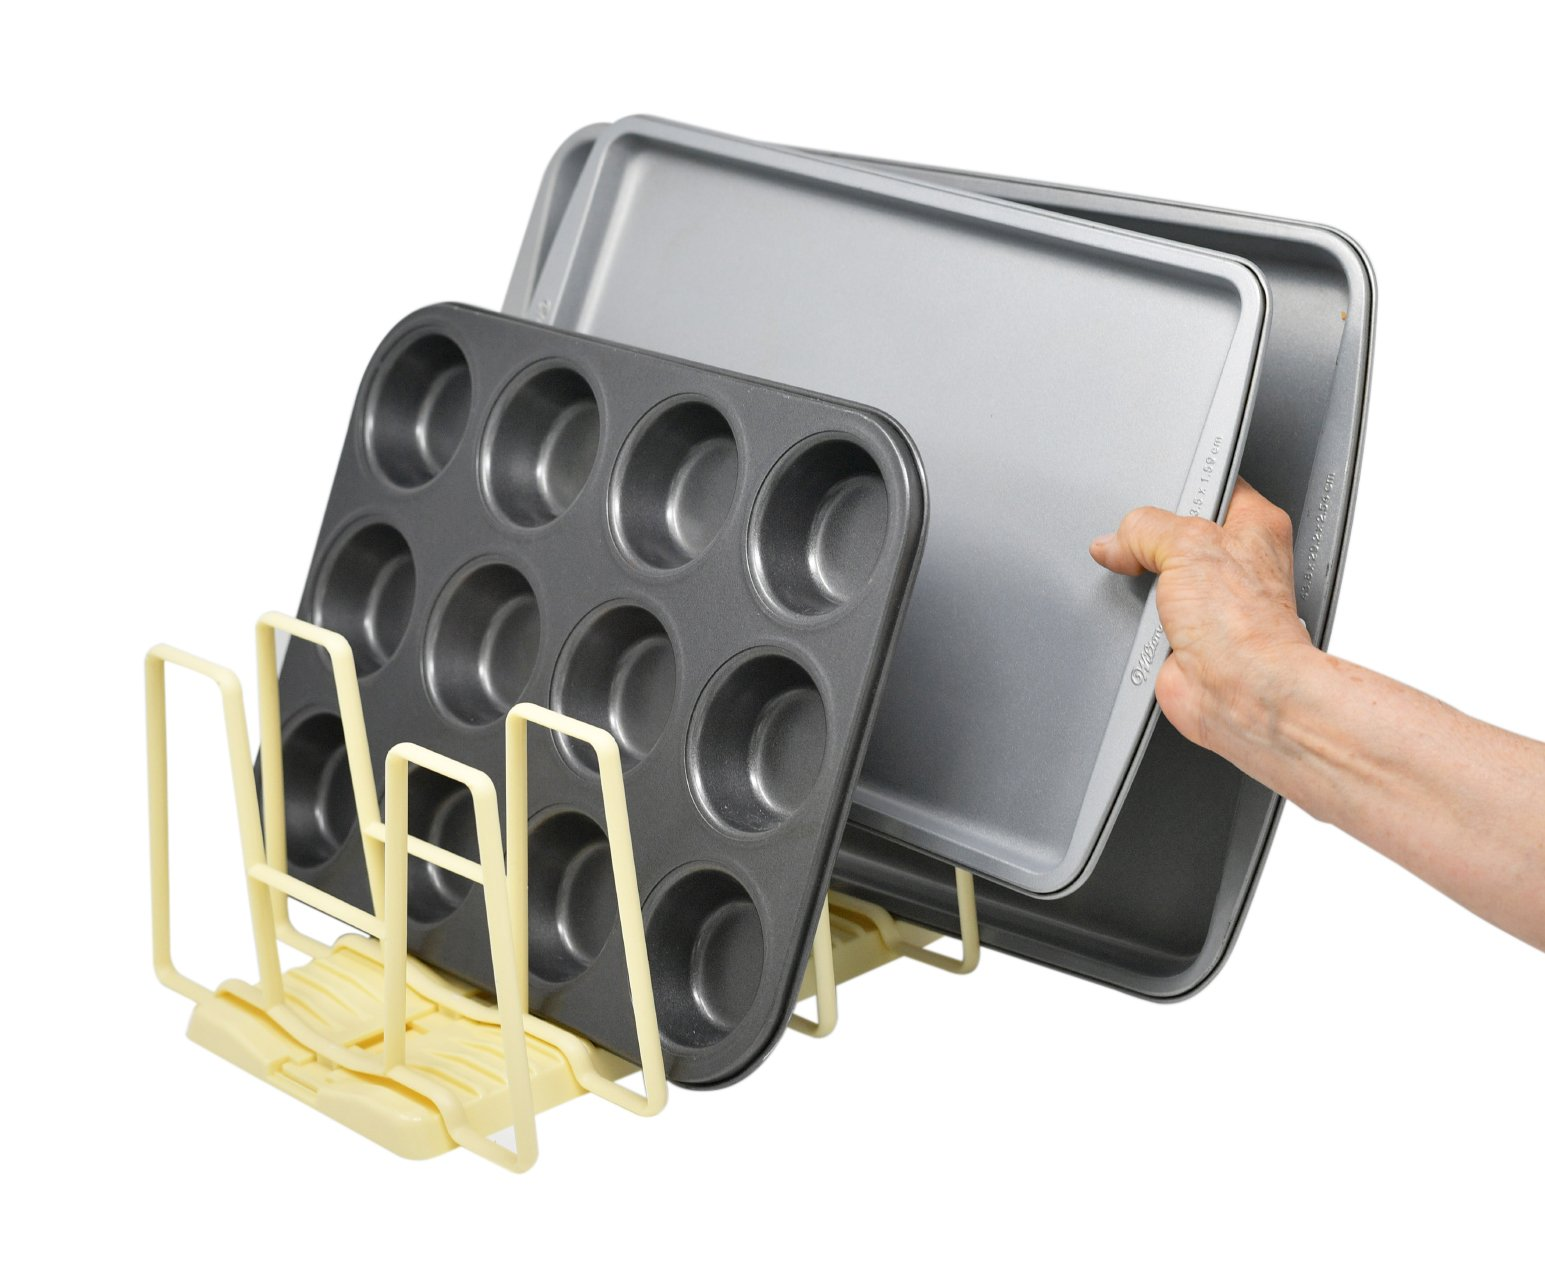 Adjustable Bakeware Organizer Rack - by Home-X